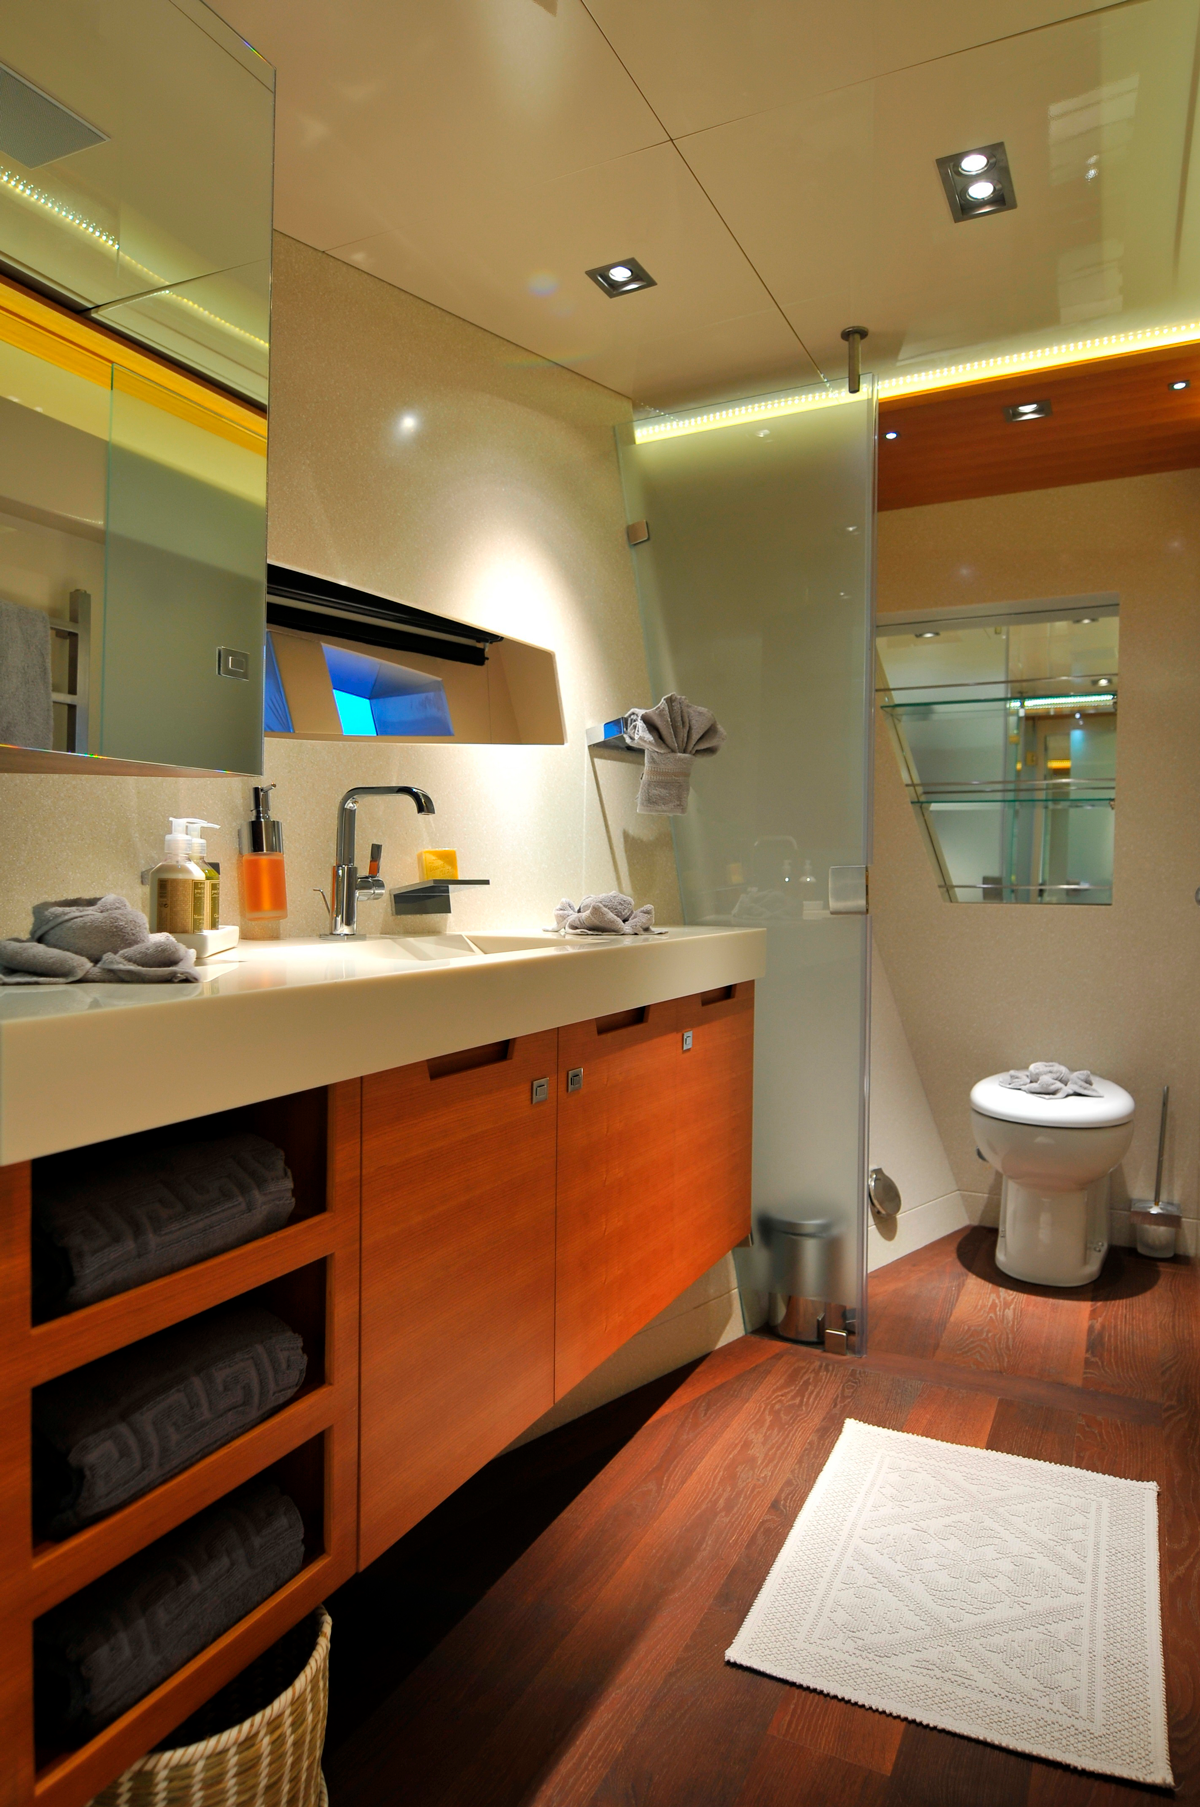 meya meya vip bathroom